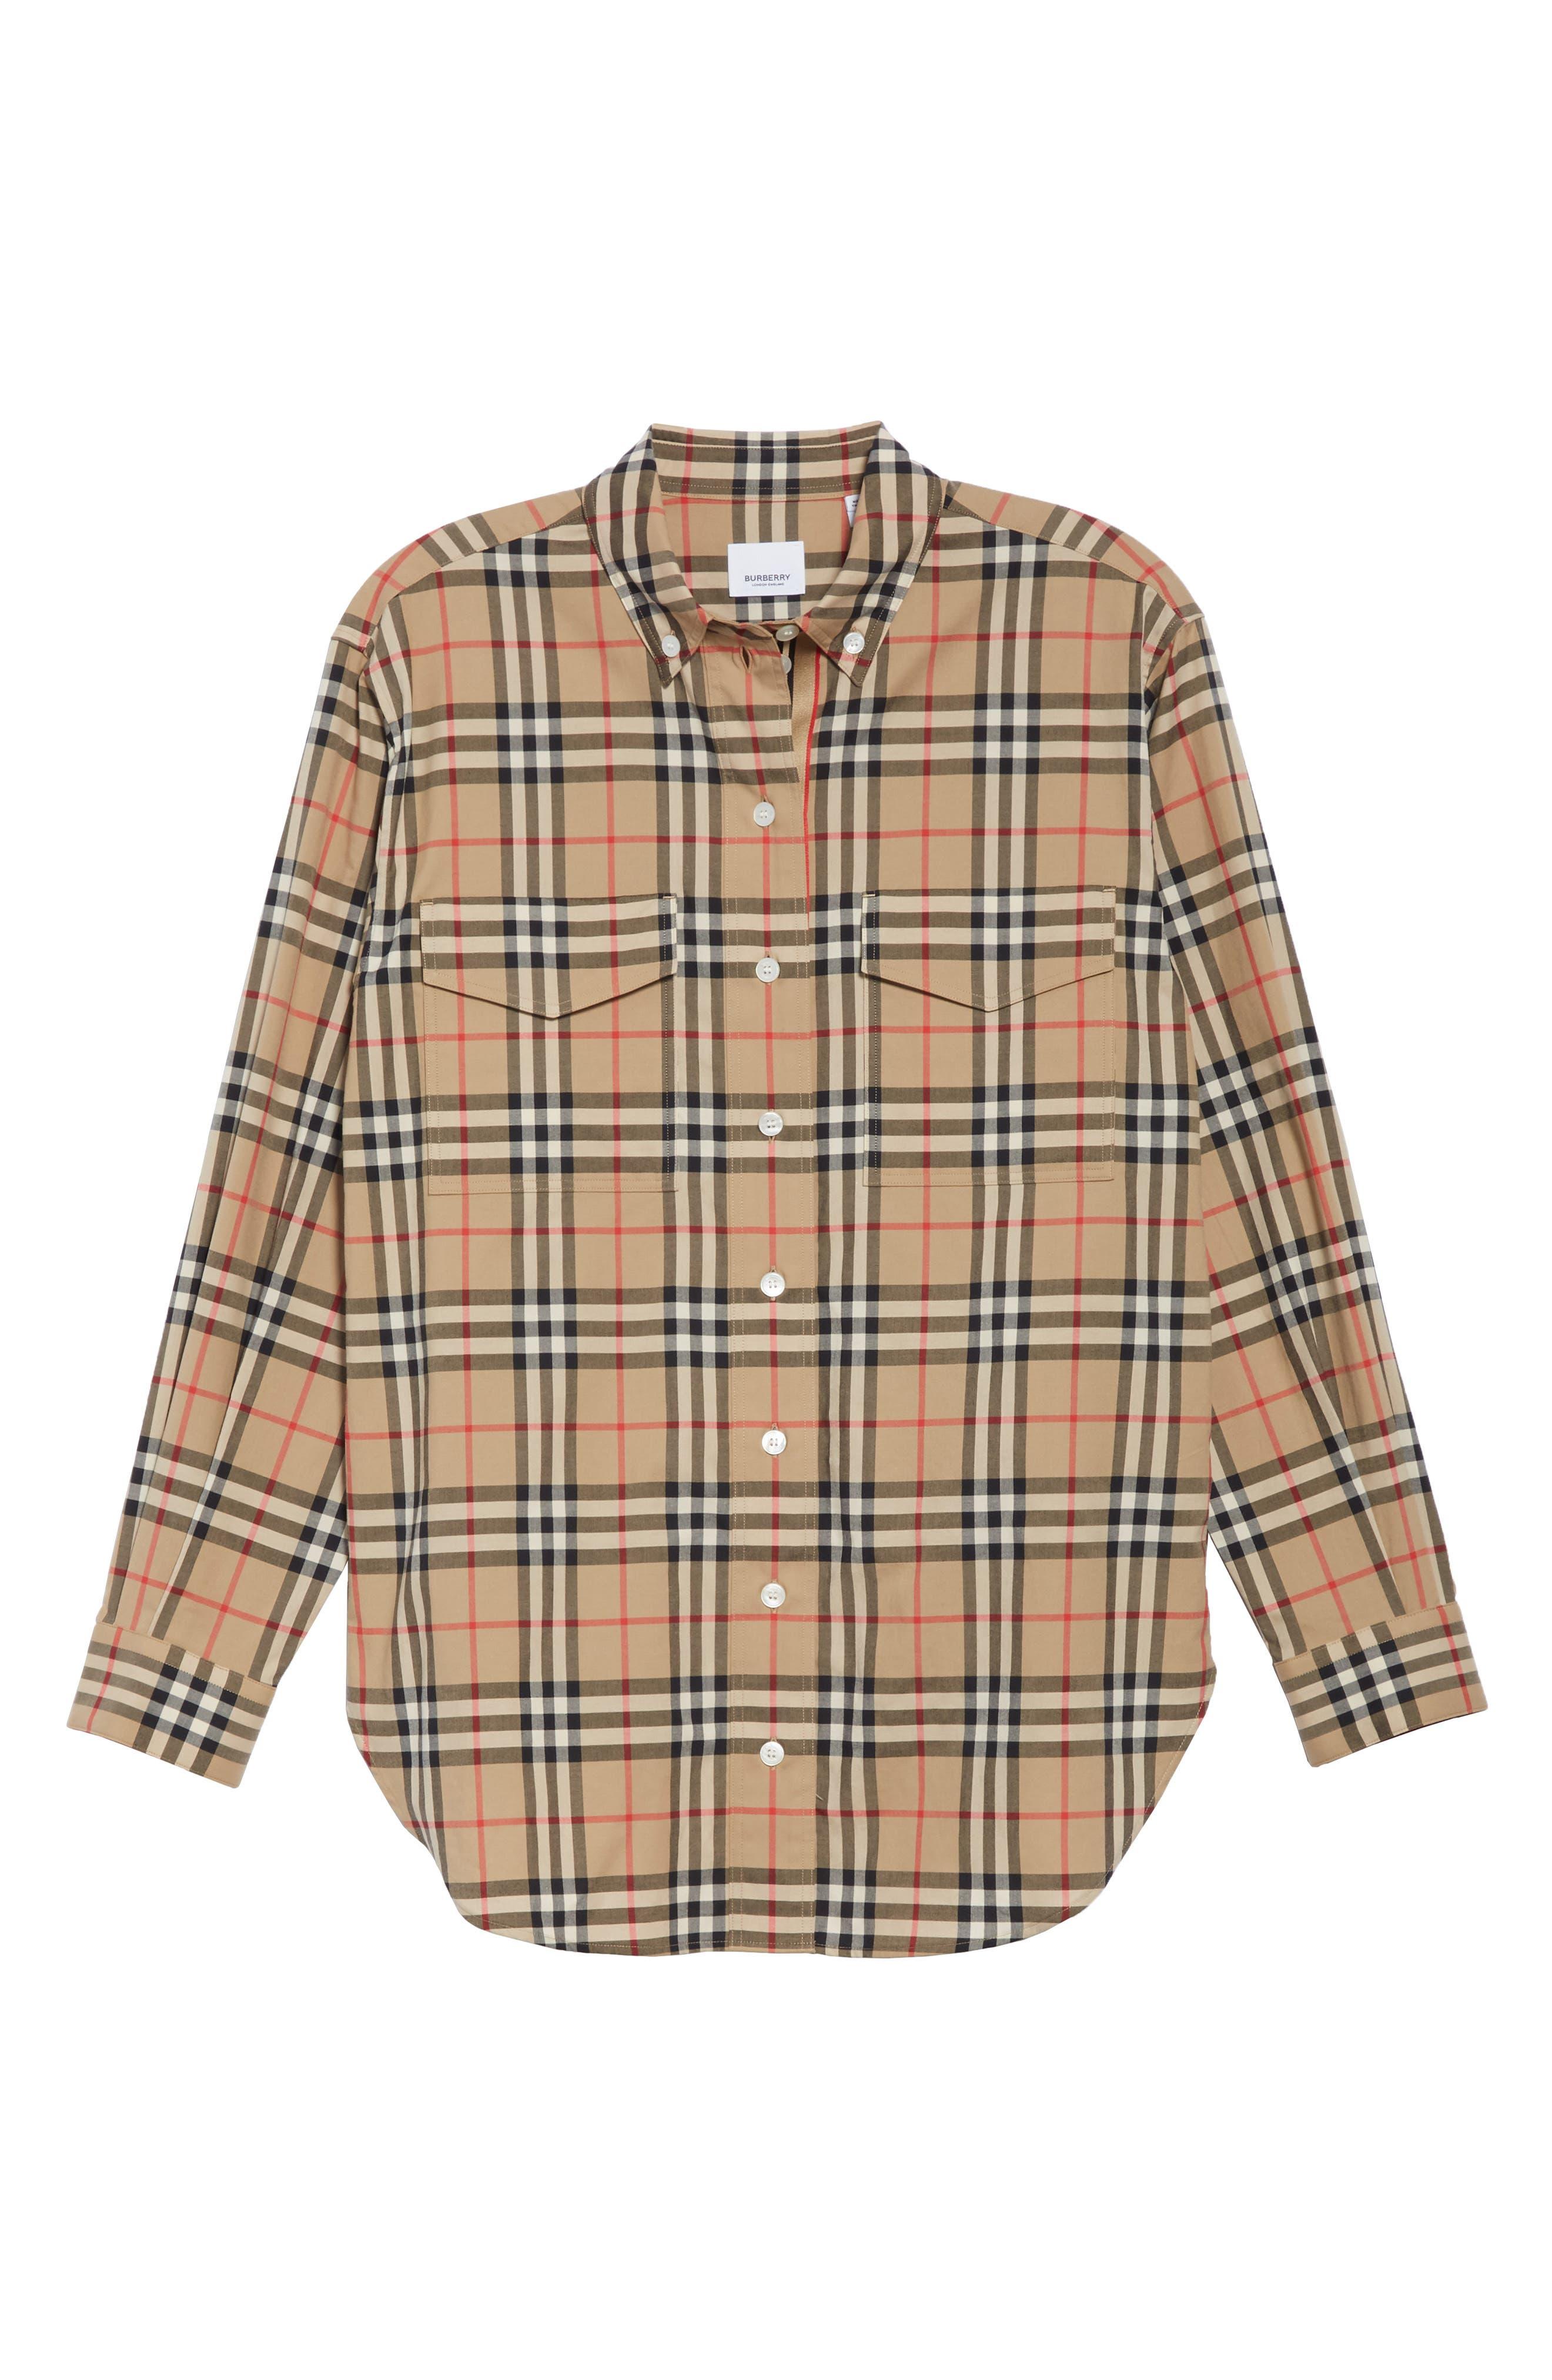 BURBERRY, Turnstone Check Shirt, Alternate thumbnail 6, color, ARCHIVE BEIGE IP CHK